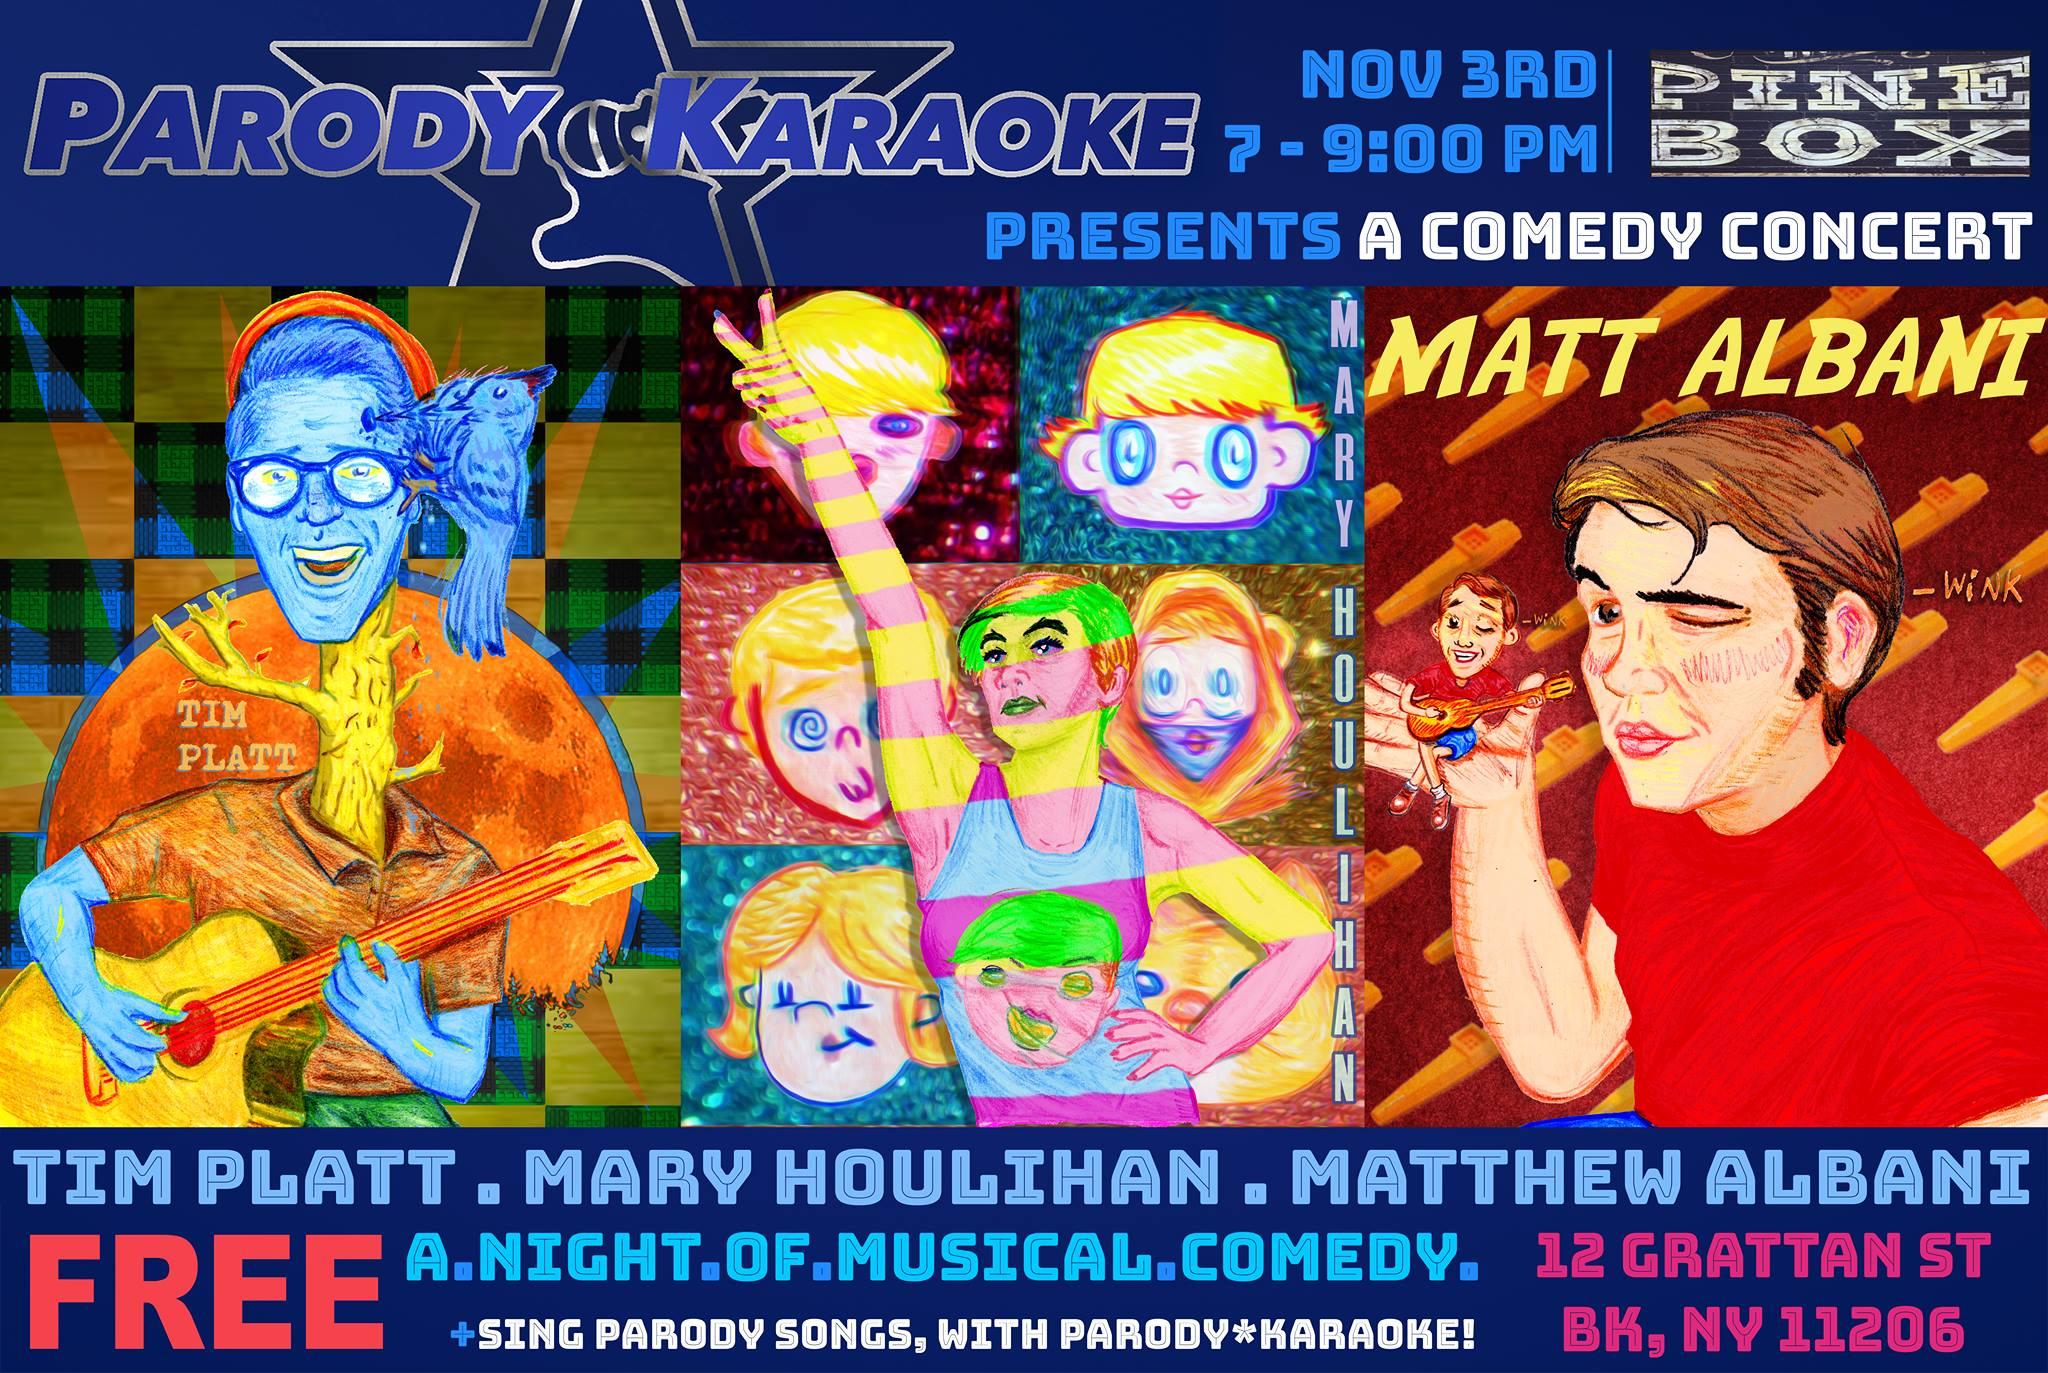 Parody*Karaoke Presents A Comedy Concert